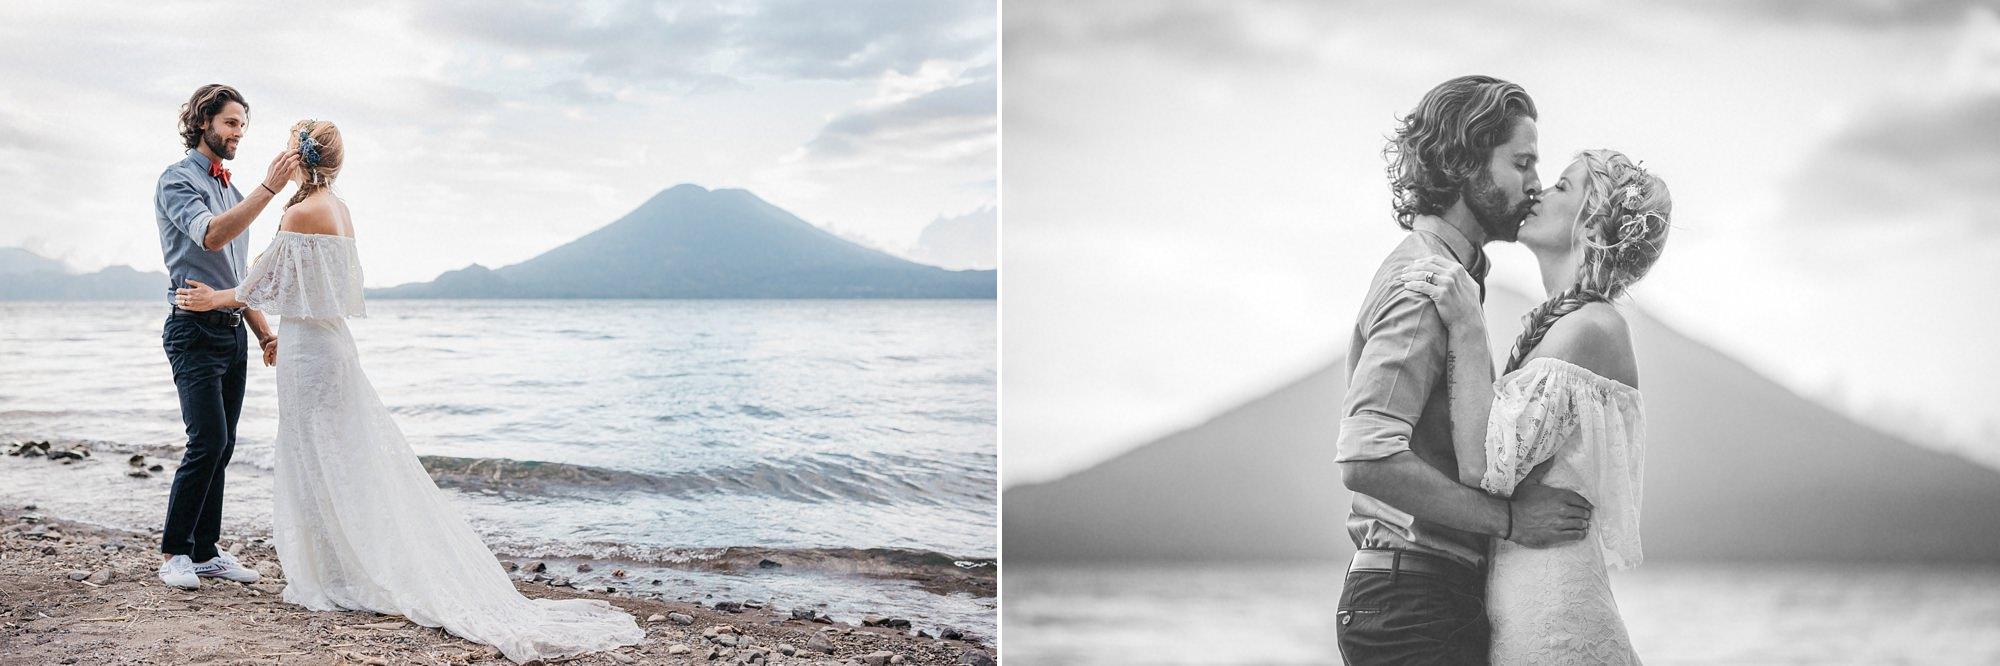 Wedding Lake Atitlan Guatemala Photography